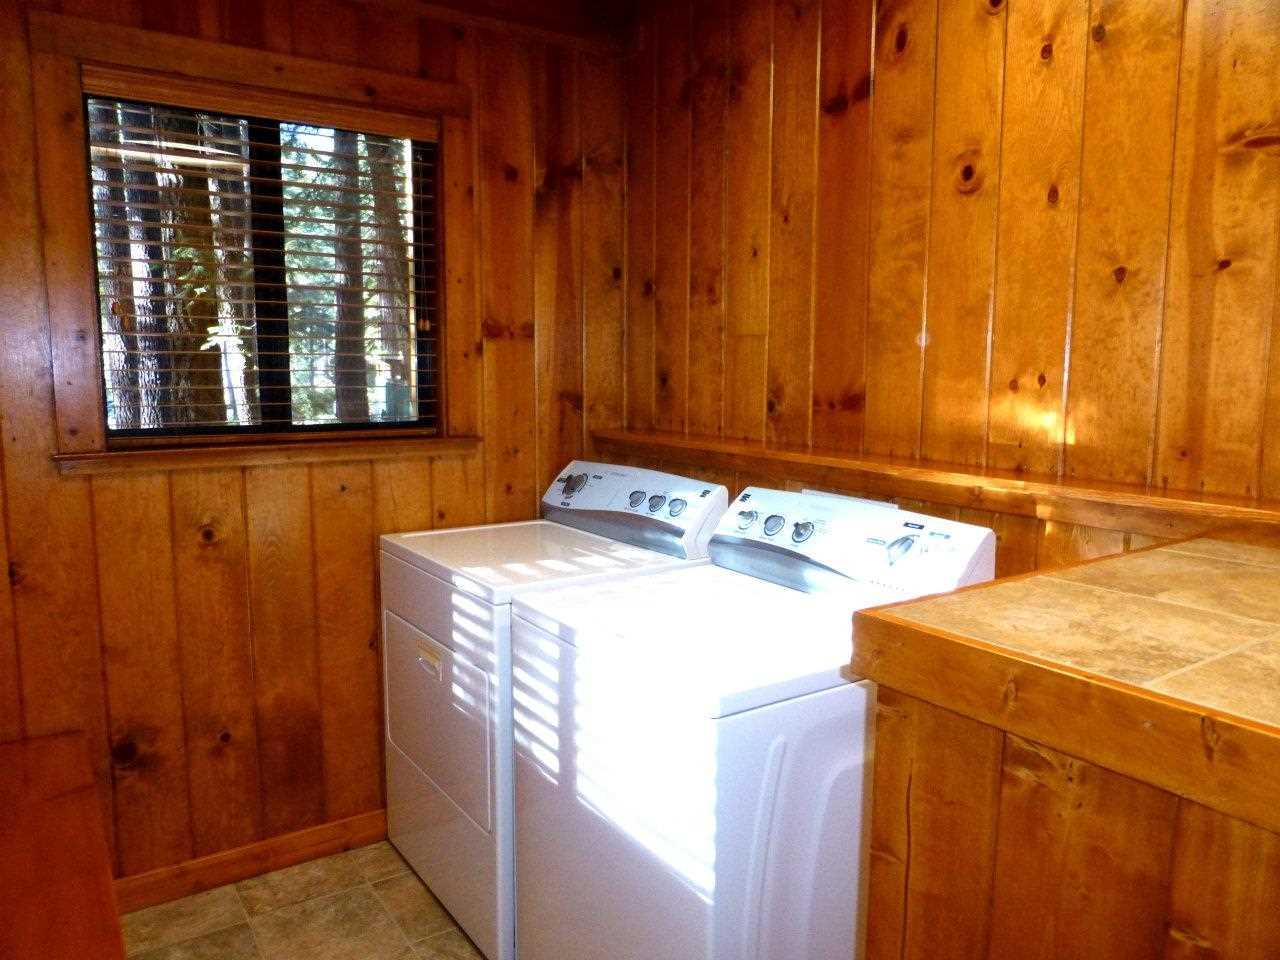 Additional photo for property listing at 910 Ward Creek Blvd 910 Ward Creek Blvd 塔霍湖城, 加利福尼亚州 96145 美国